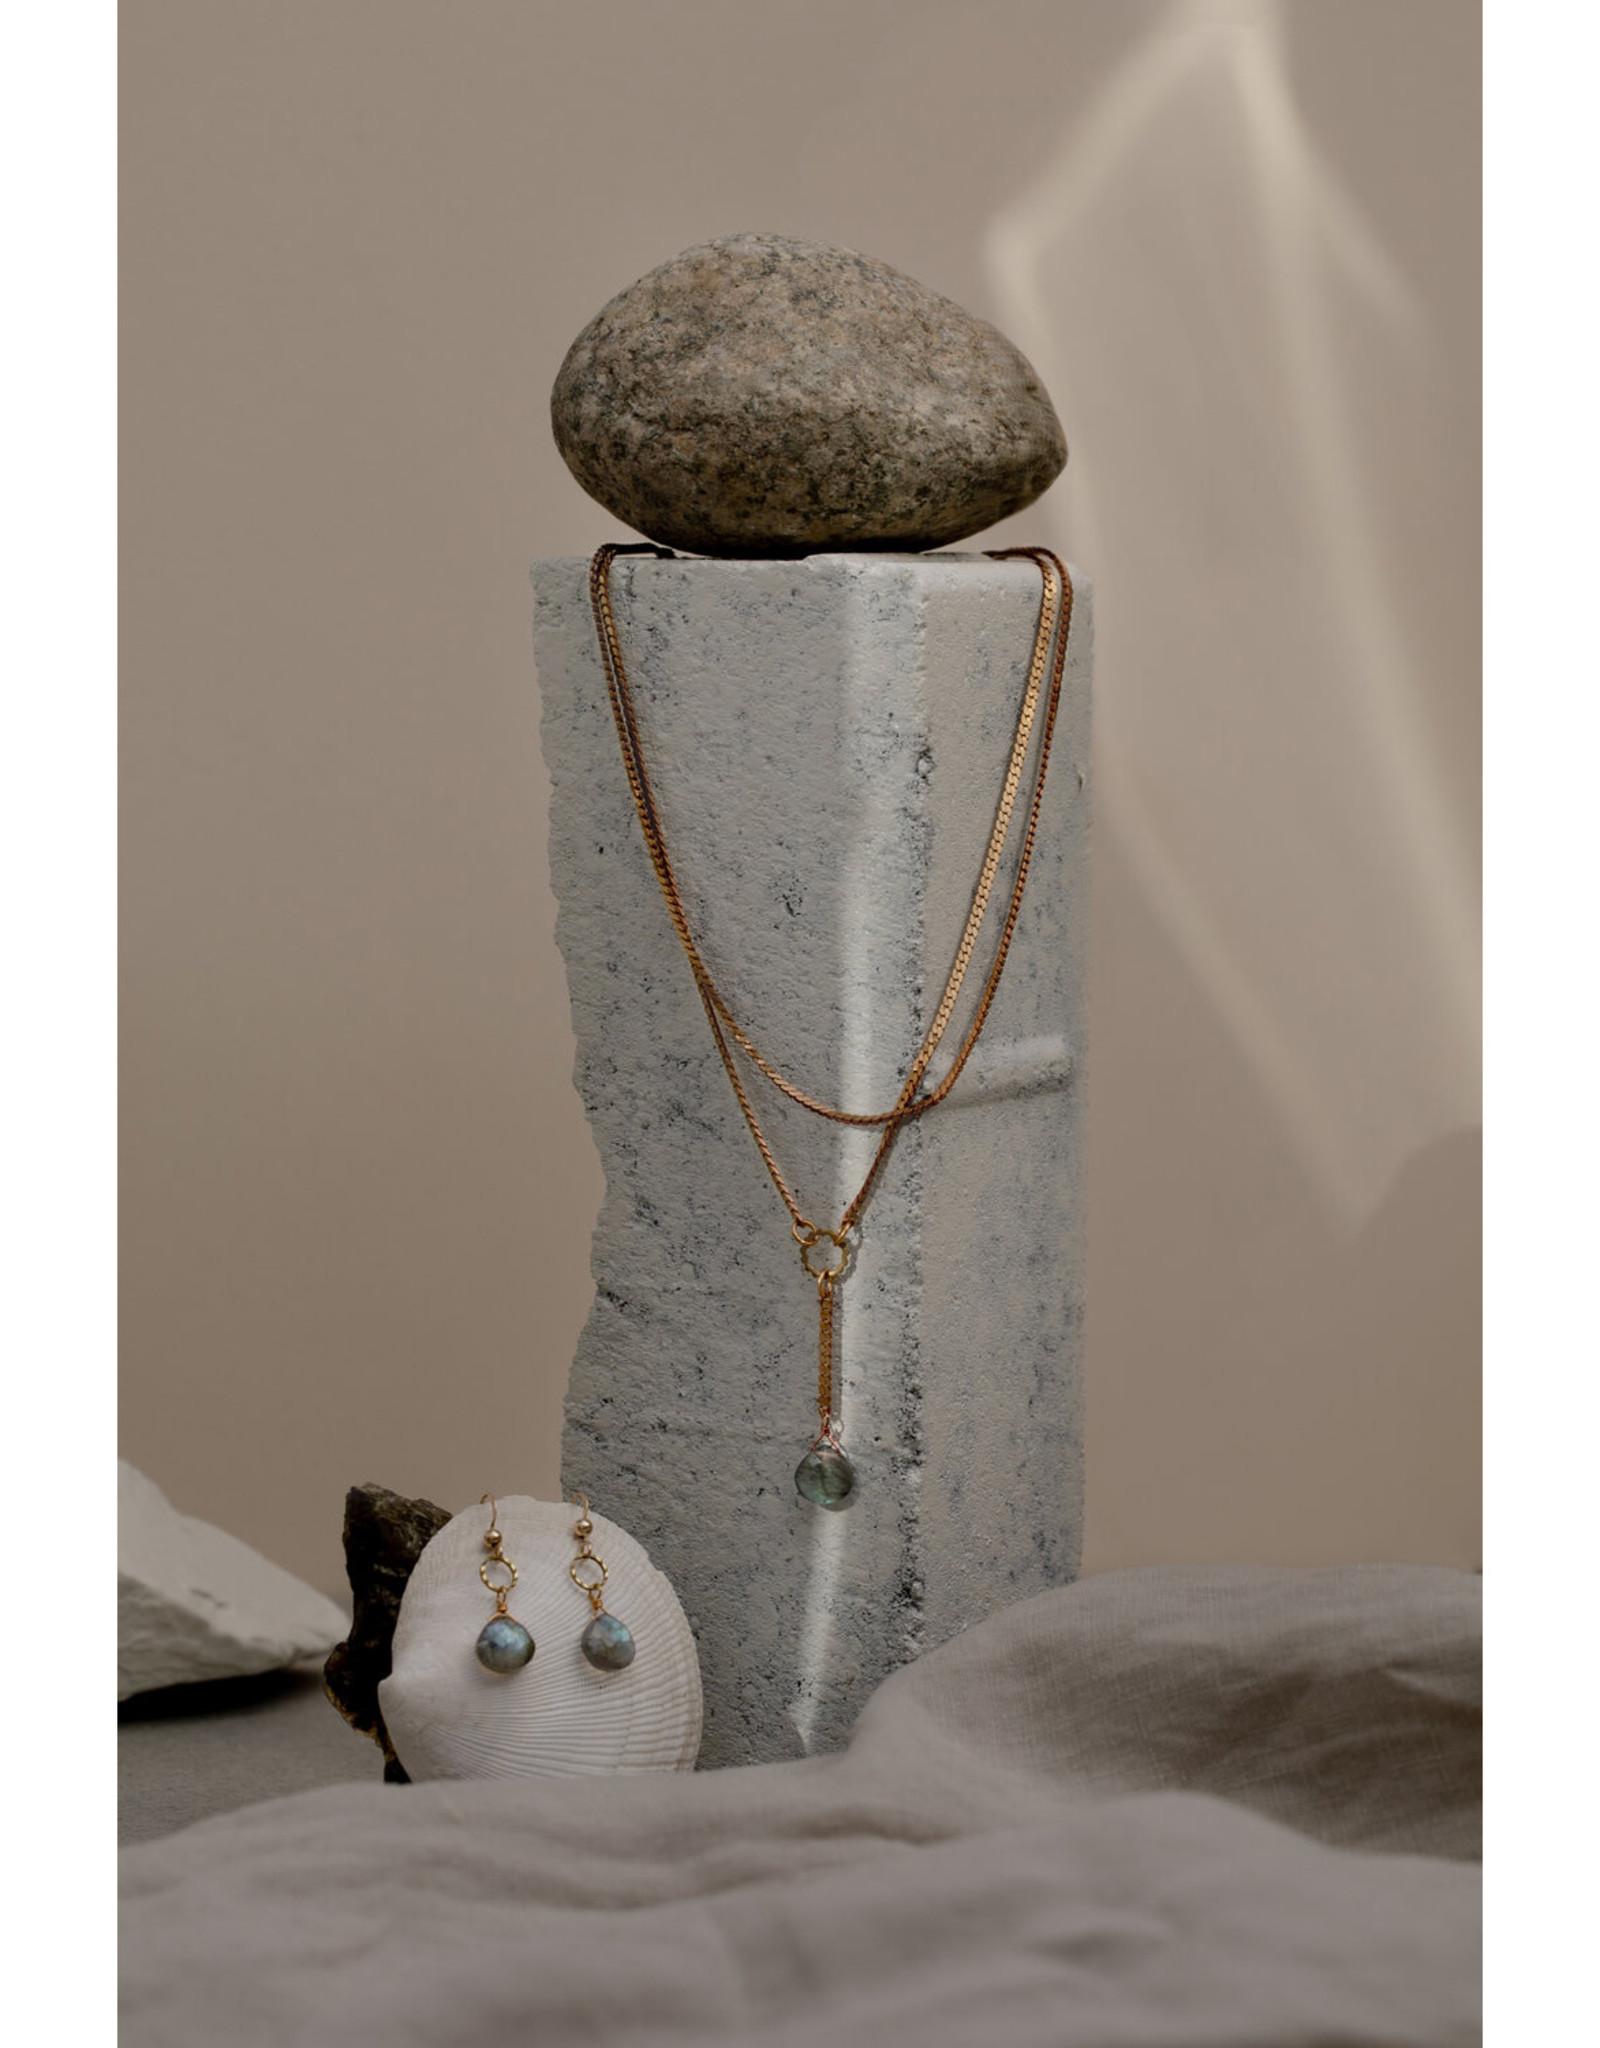 Hailey Gerrits Designs Sidra Necklace - Moonstone